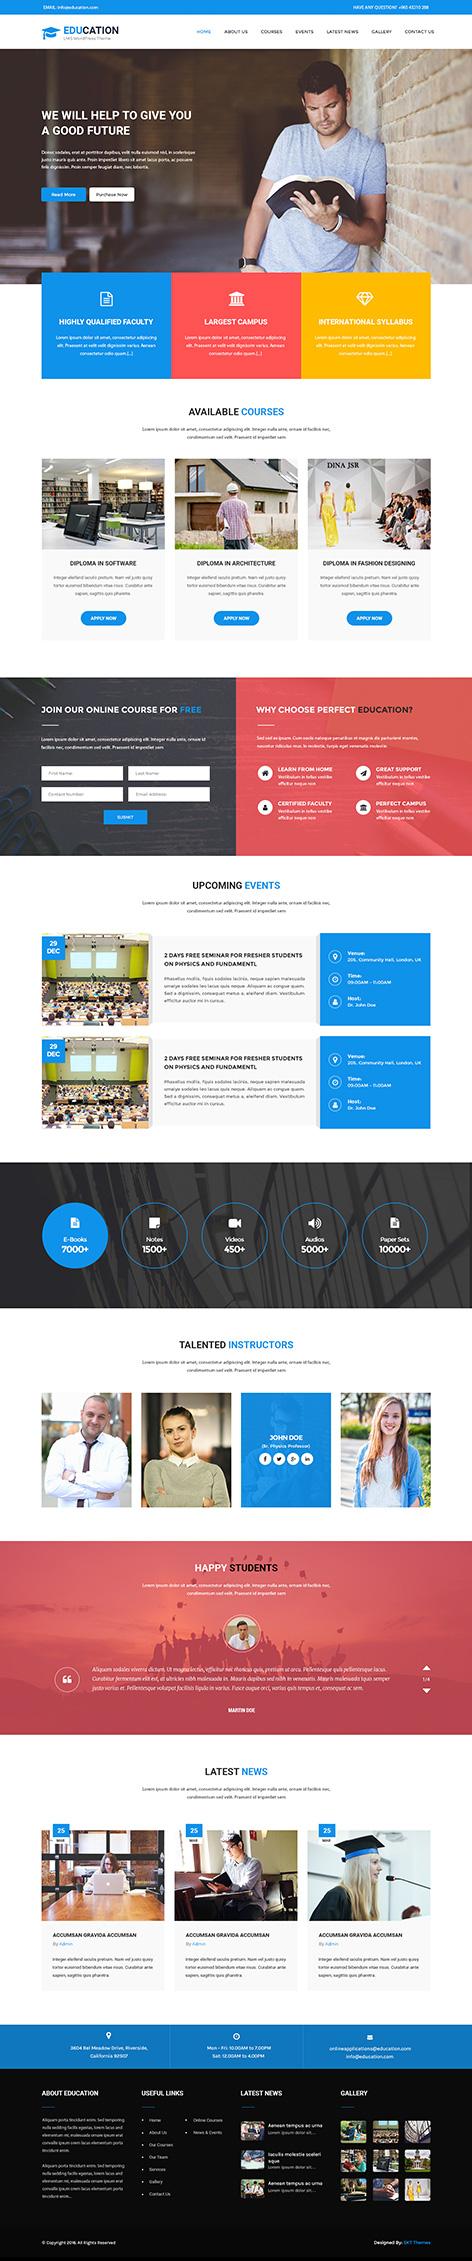 LMS wordpress theme1 - Education